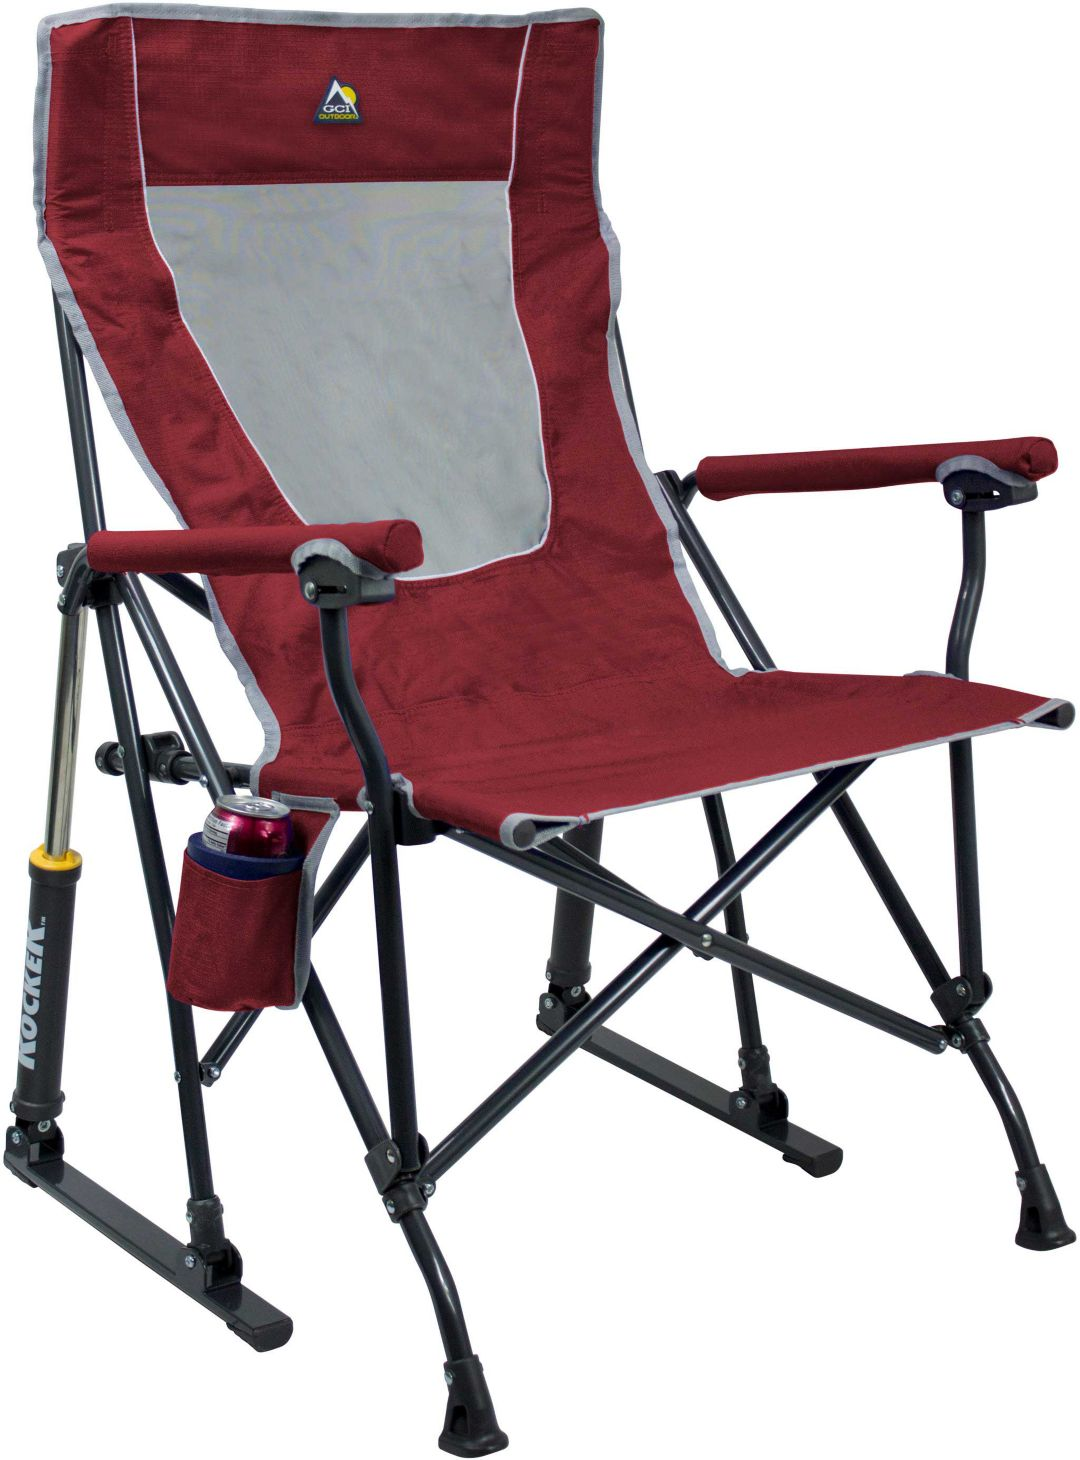 Wondrous Gci Outdoor Roadtrip Rocker Chair Ibusinesslaw Wood Chair Design Ideas Ibusinesslaworg